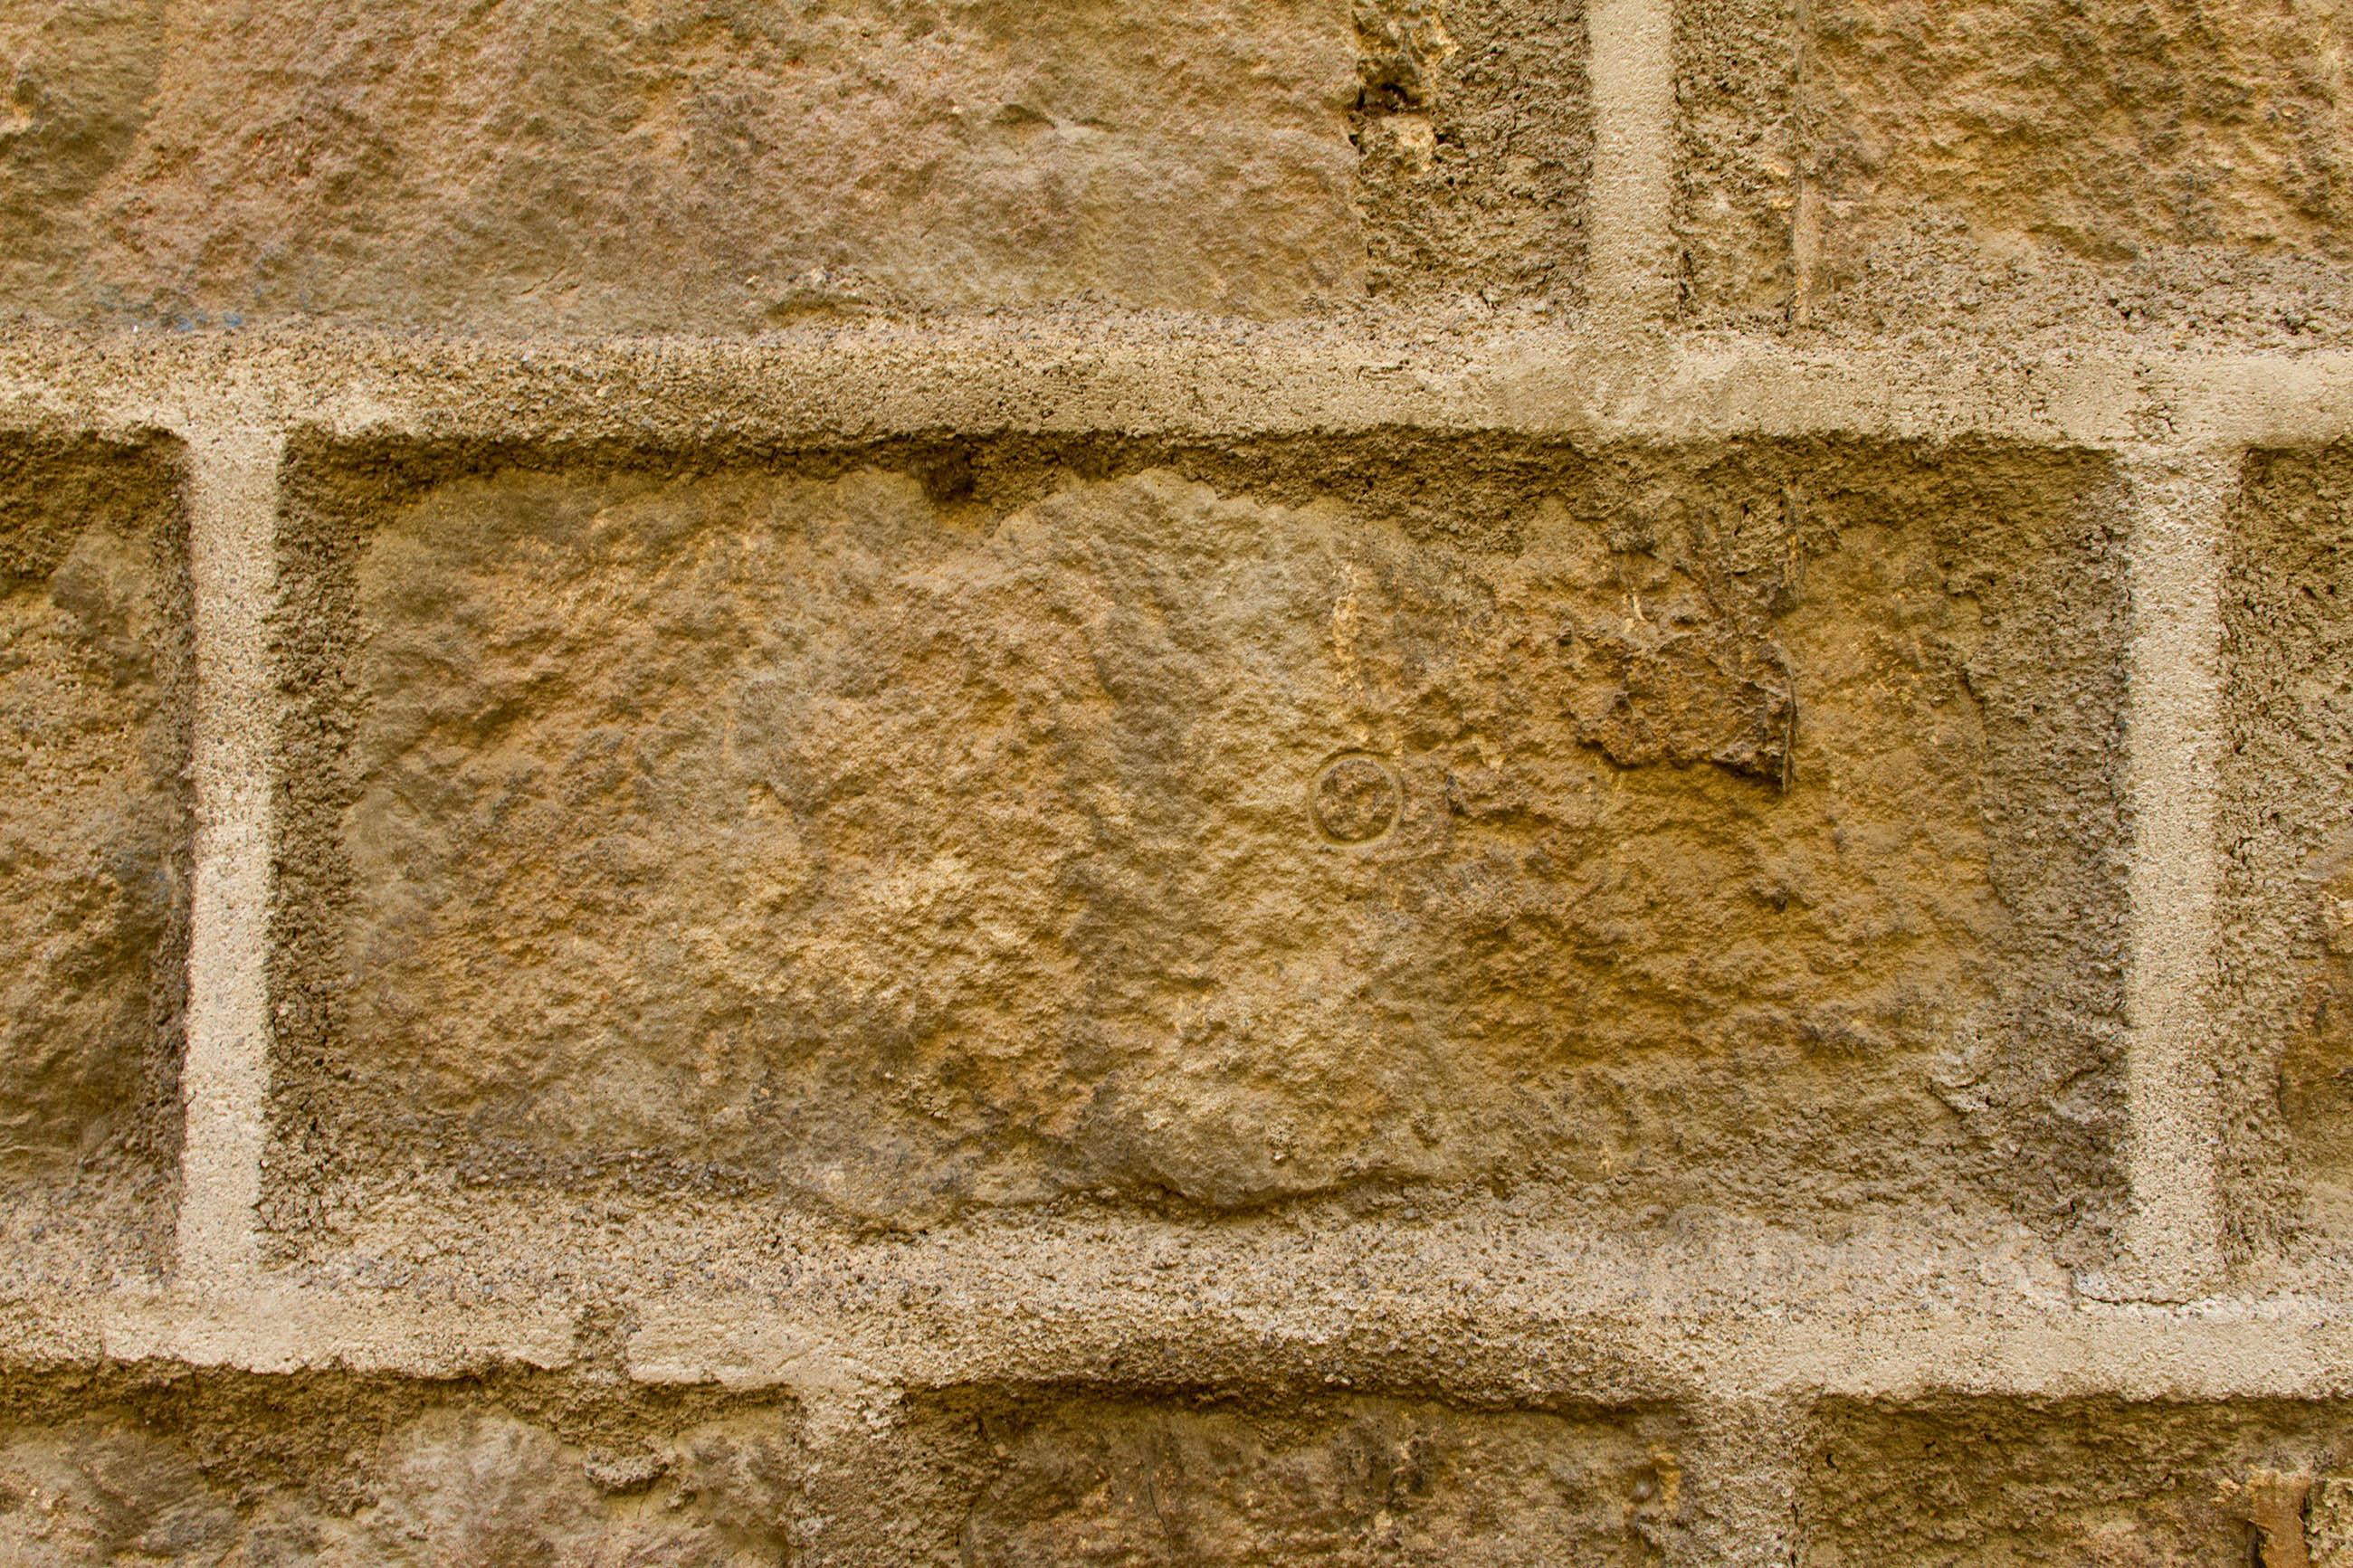 Brick Texture, Aged, Material, Wall, Texture, HQ Photo